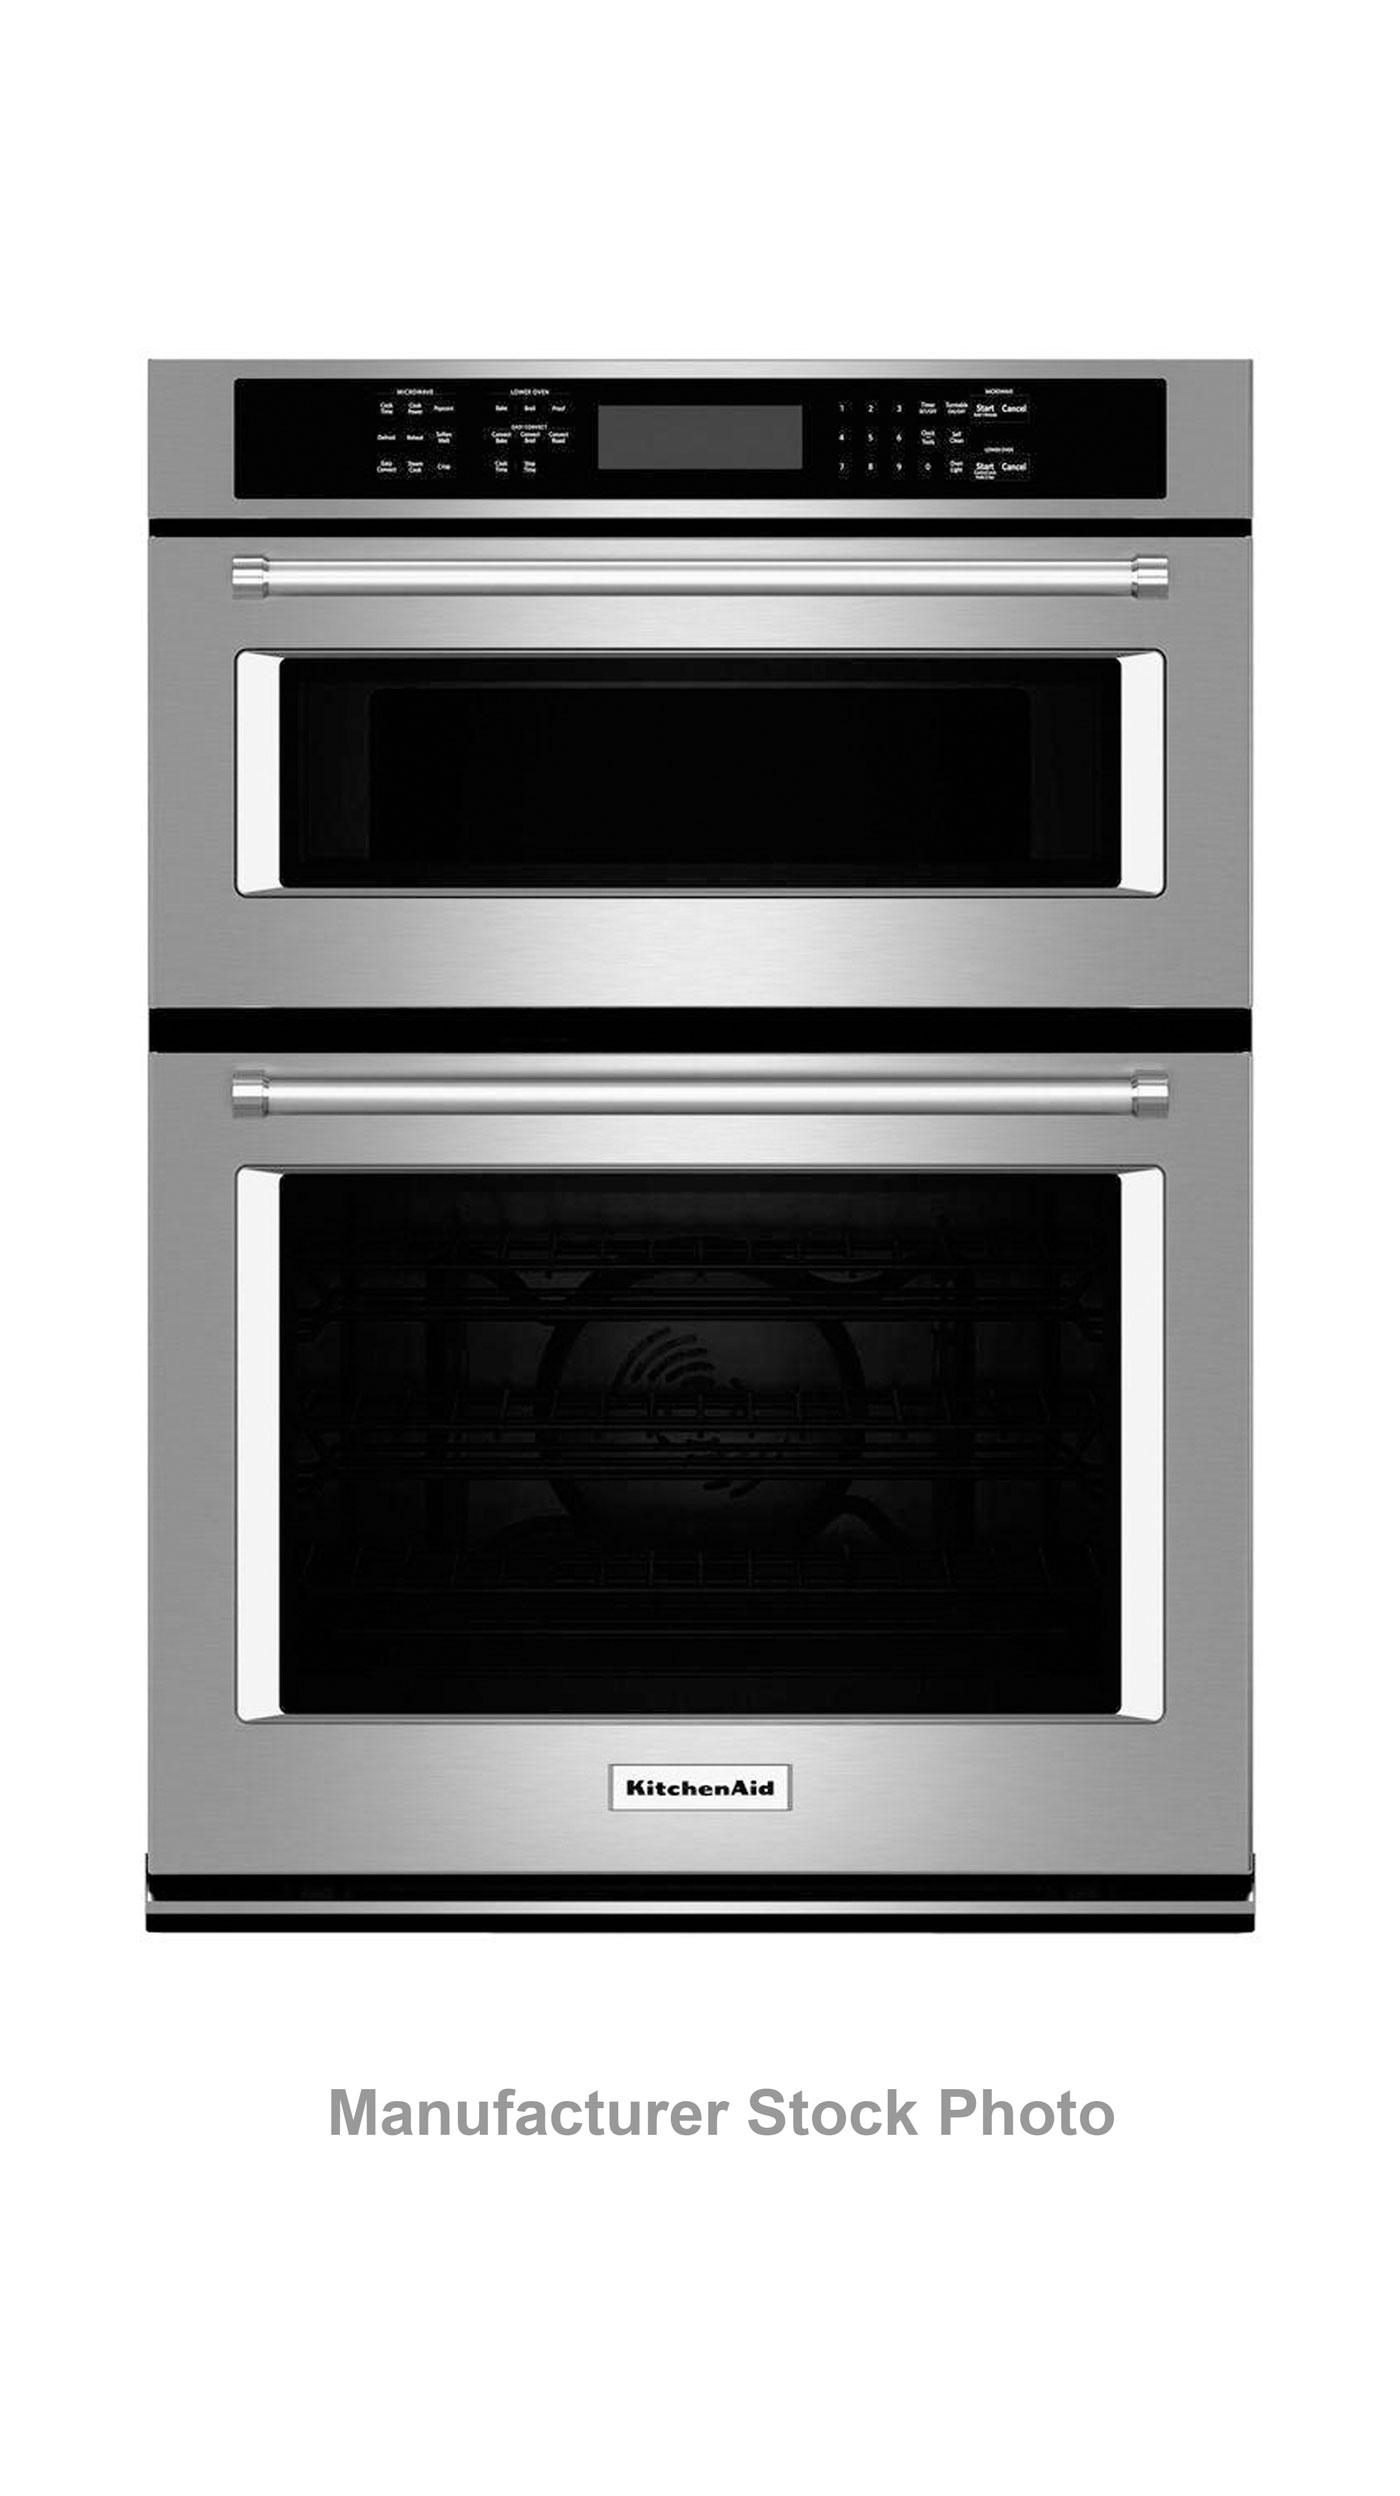 "27"" KitchenAid KOCE507ESS Combination Wall Oven"